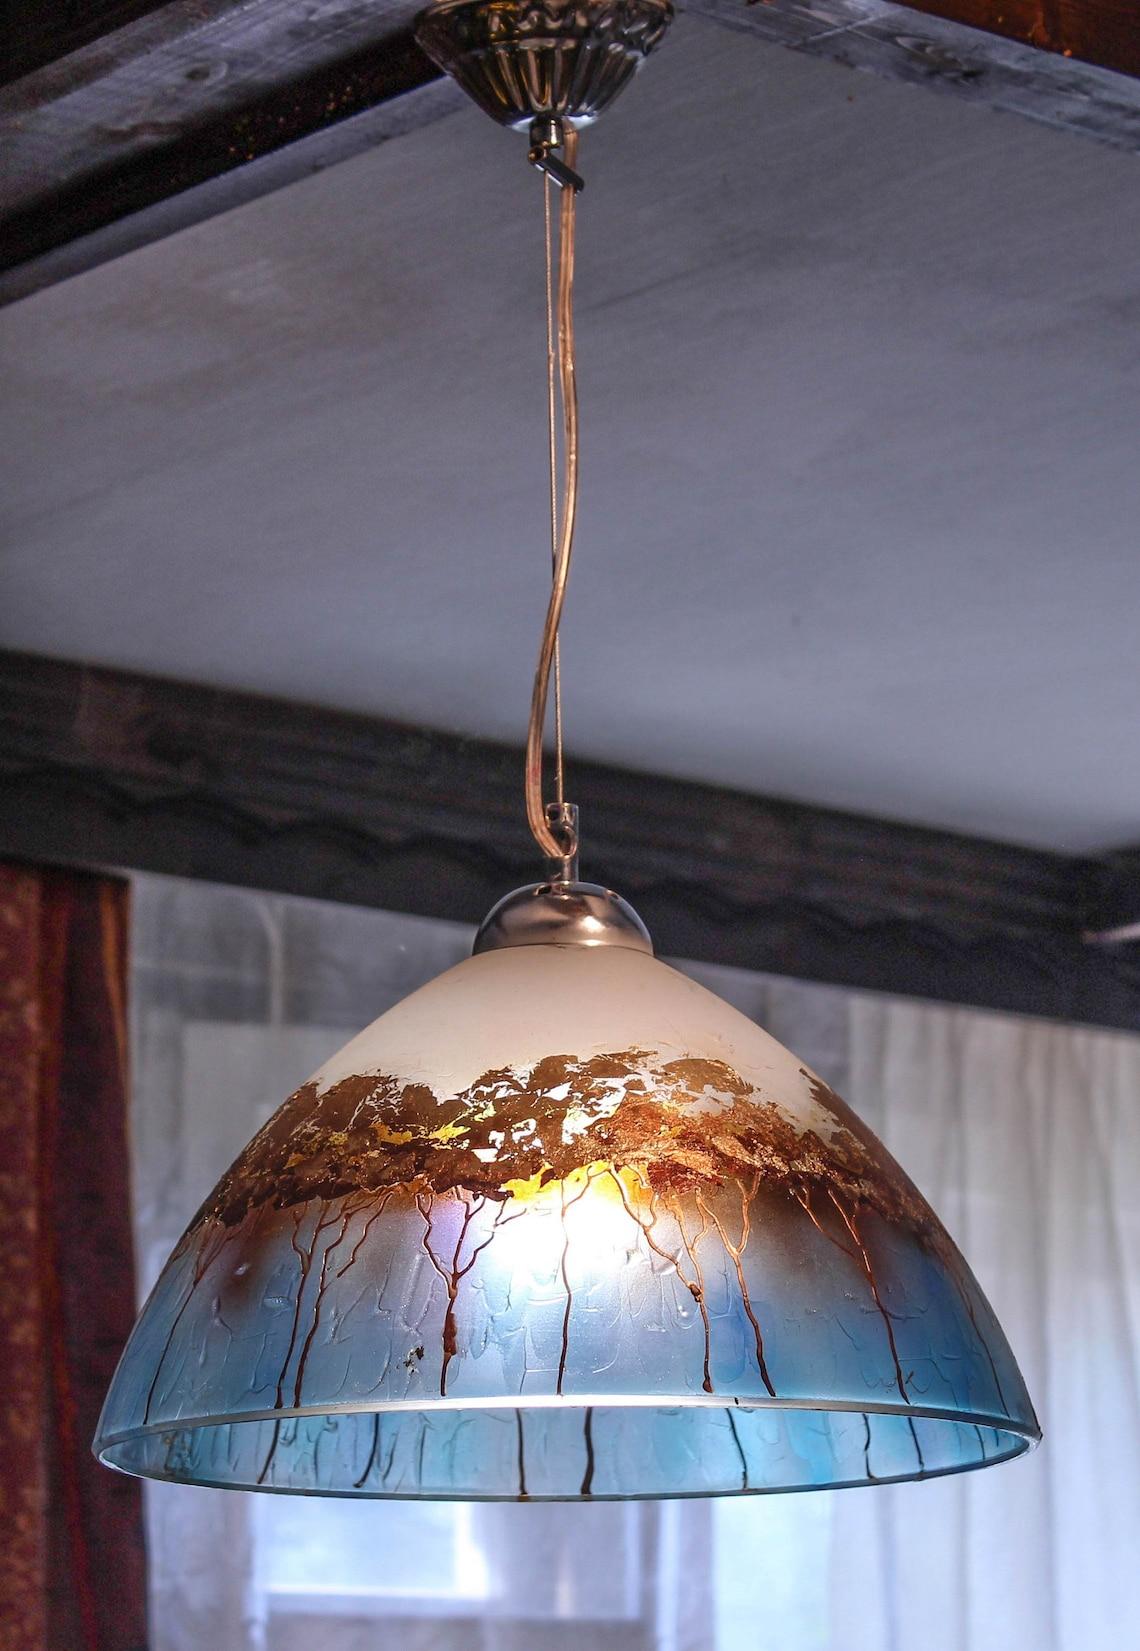 Pendant Light Hanging Light Glass Lamp Shade Island Kitchen Lighting Ceiling Light Dining Room Light Beach